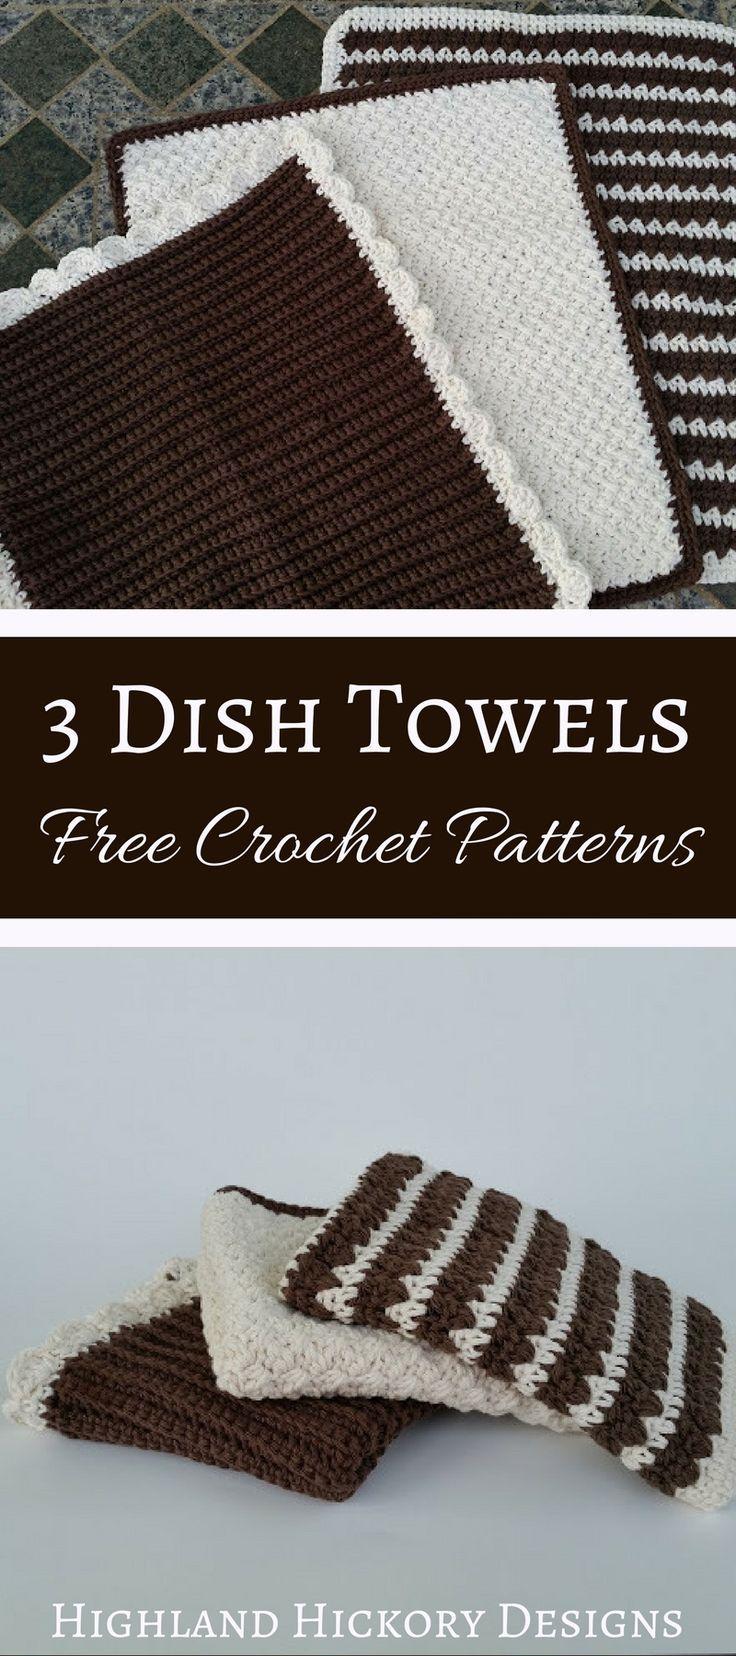 Dish Towels or Dish Mat - Free Crochet Pattern | Pinterest | Kitchen ...